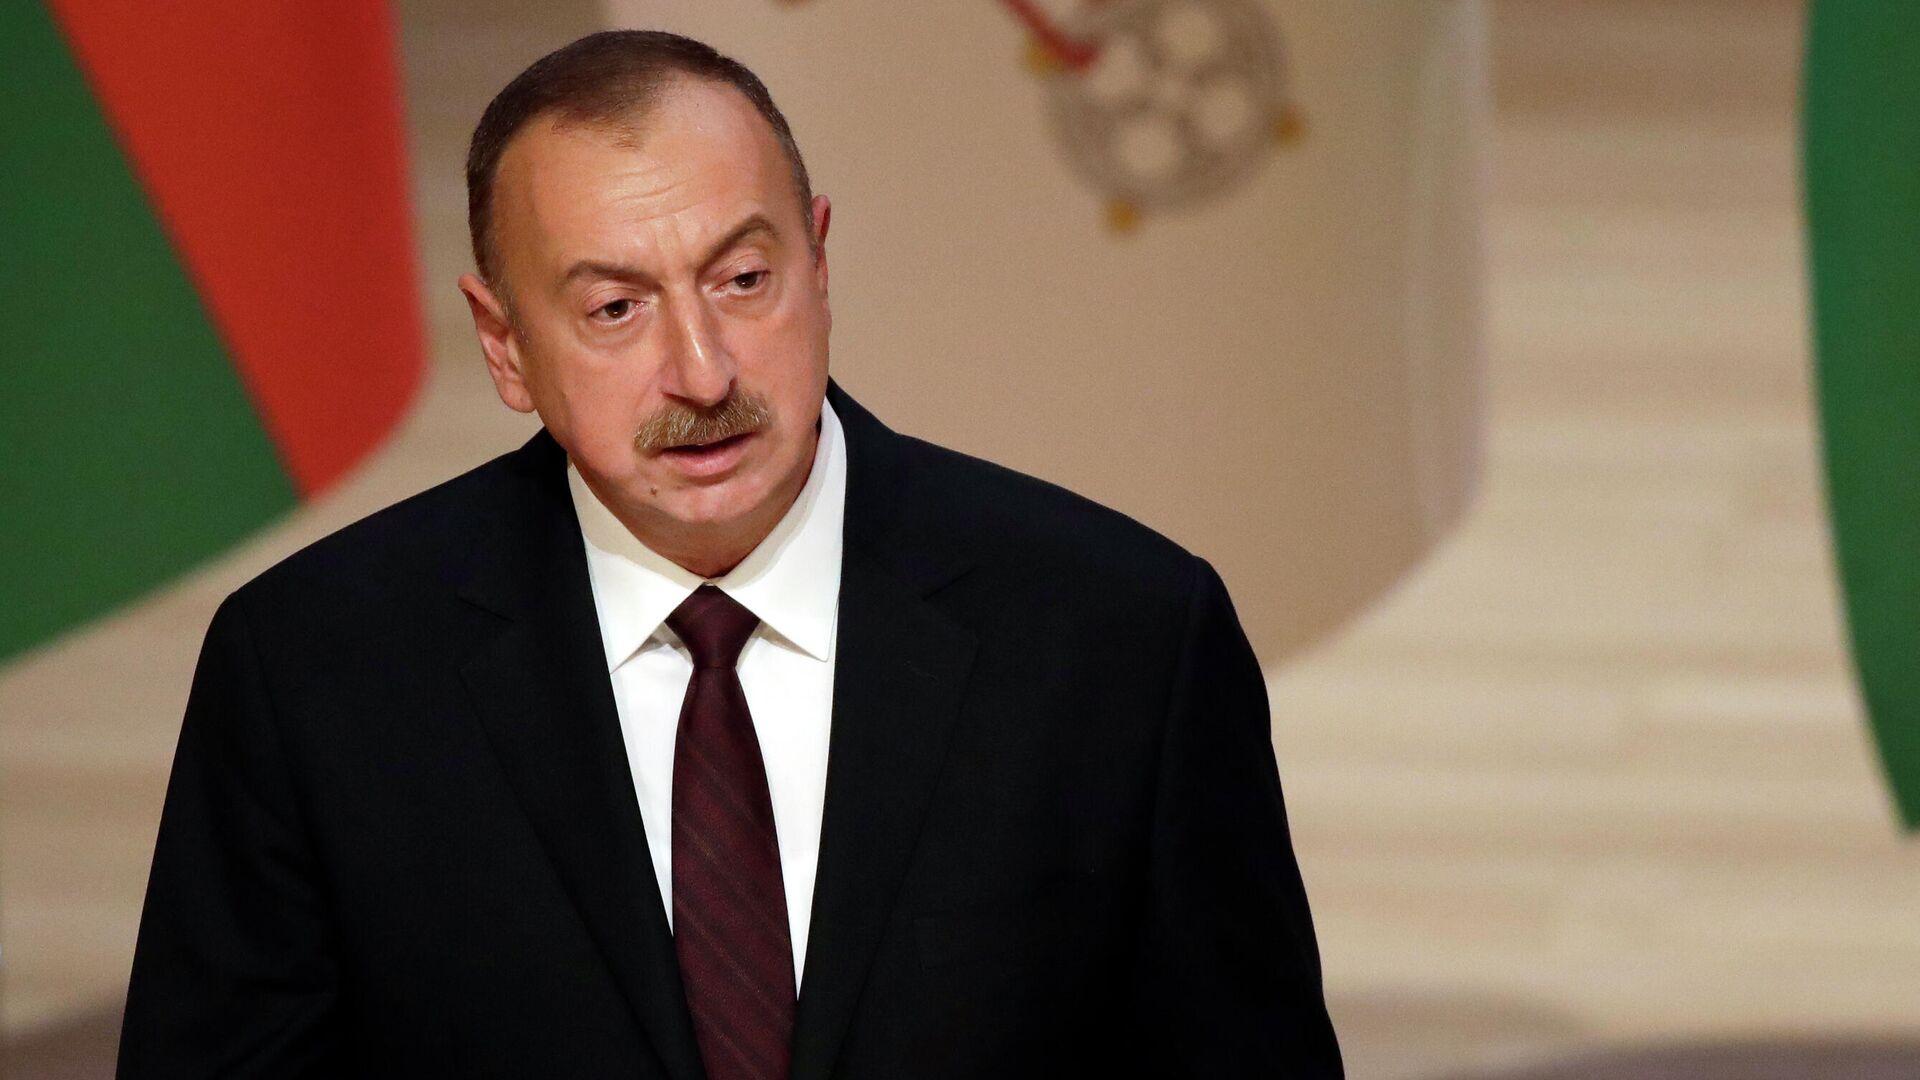 Президент Азербайджана Ильхам Алиев - РИА Новости, 1920, 21.10.2020